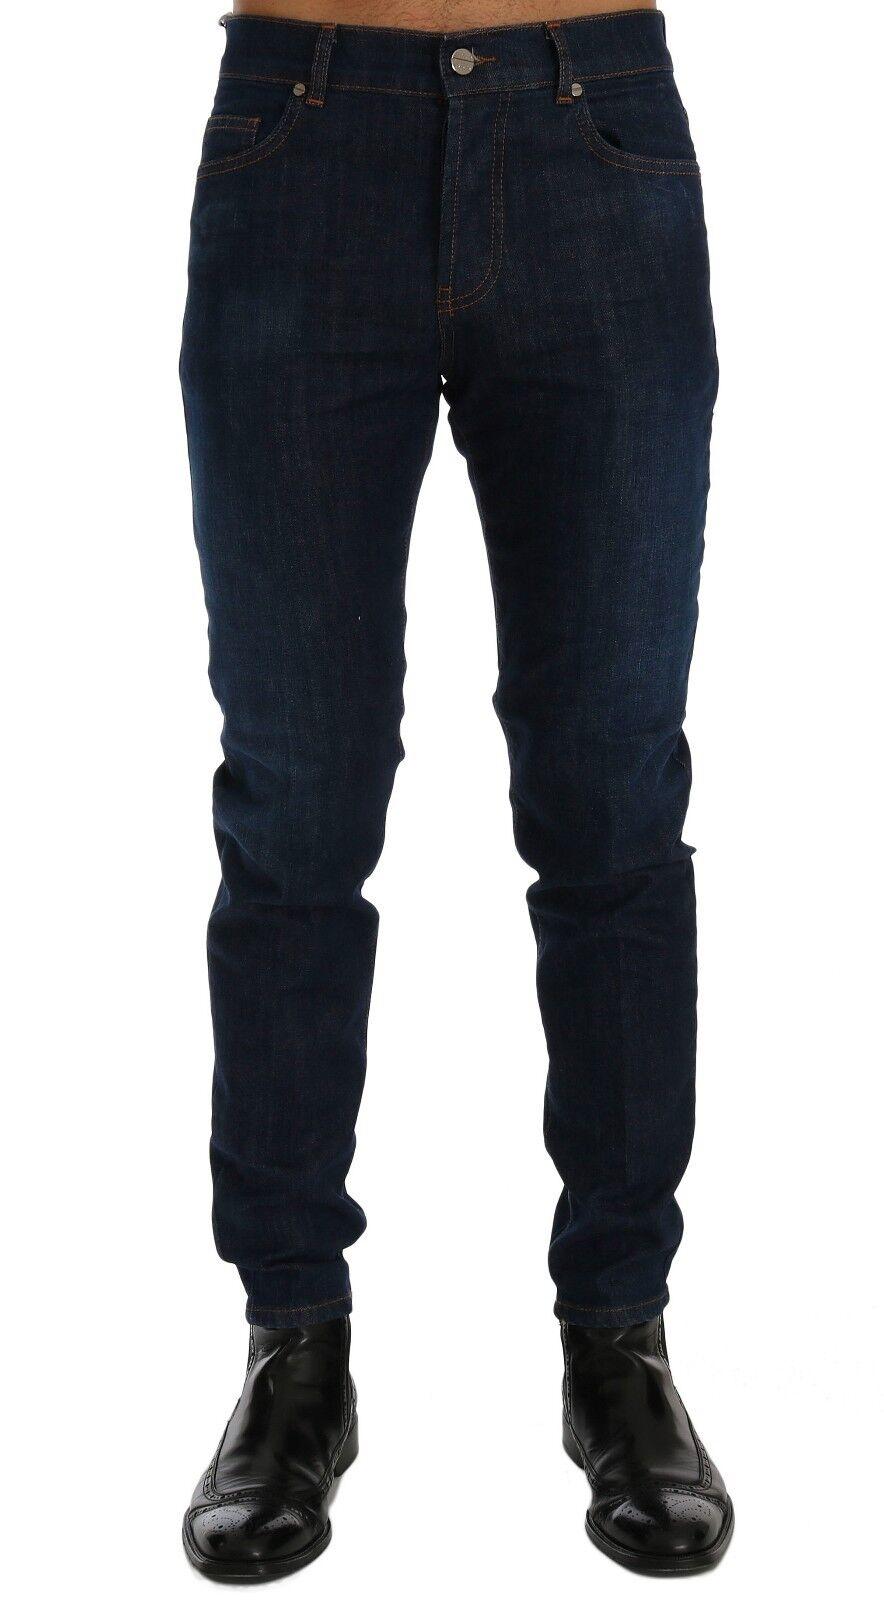 NEW FRANKIE MORELLO Jeans bluee Wash Aberdeen Slim Fit Denim Stretch s. W38